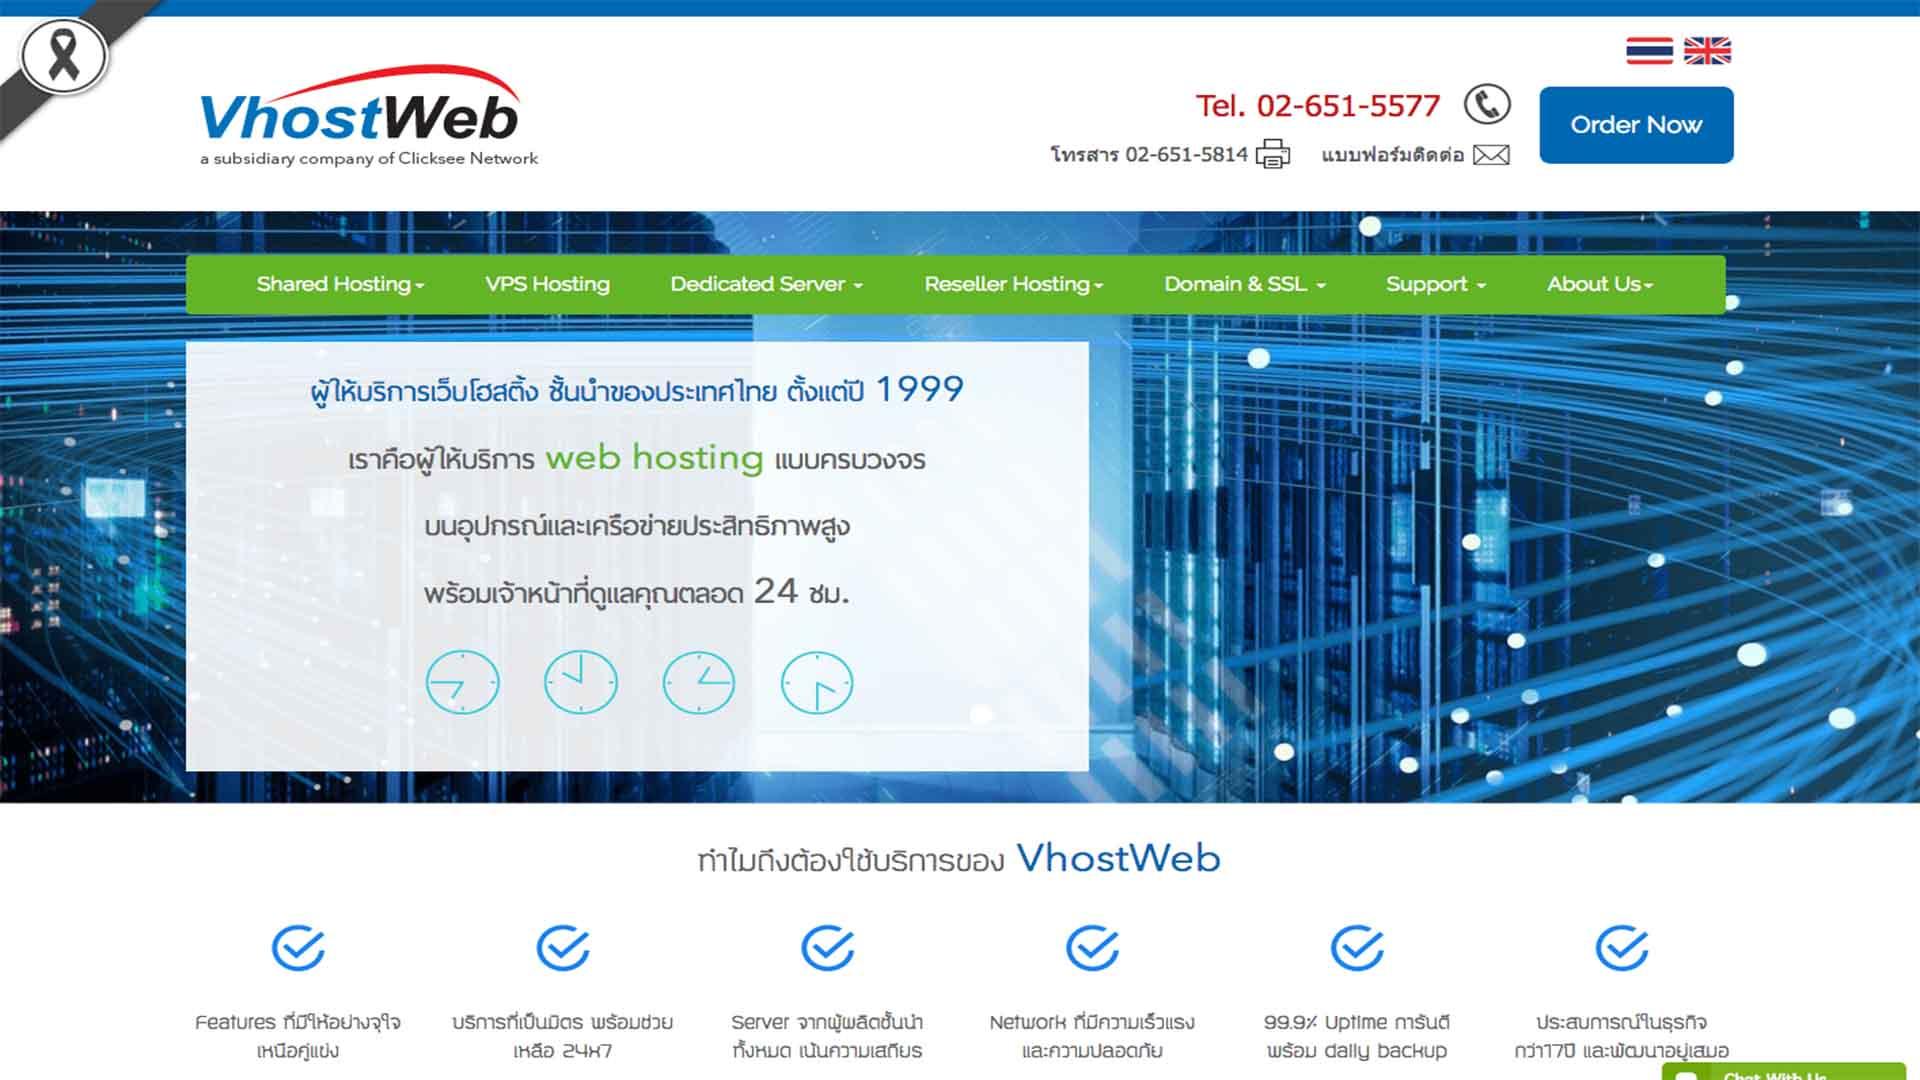 VhostWeb_hostfreeze